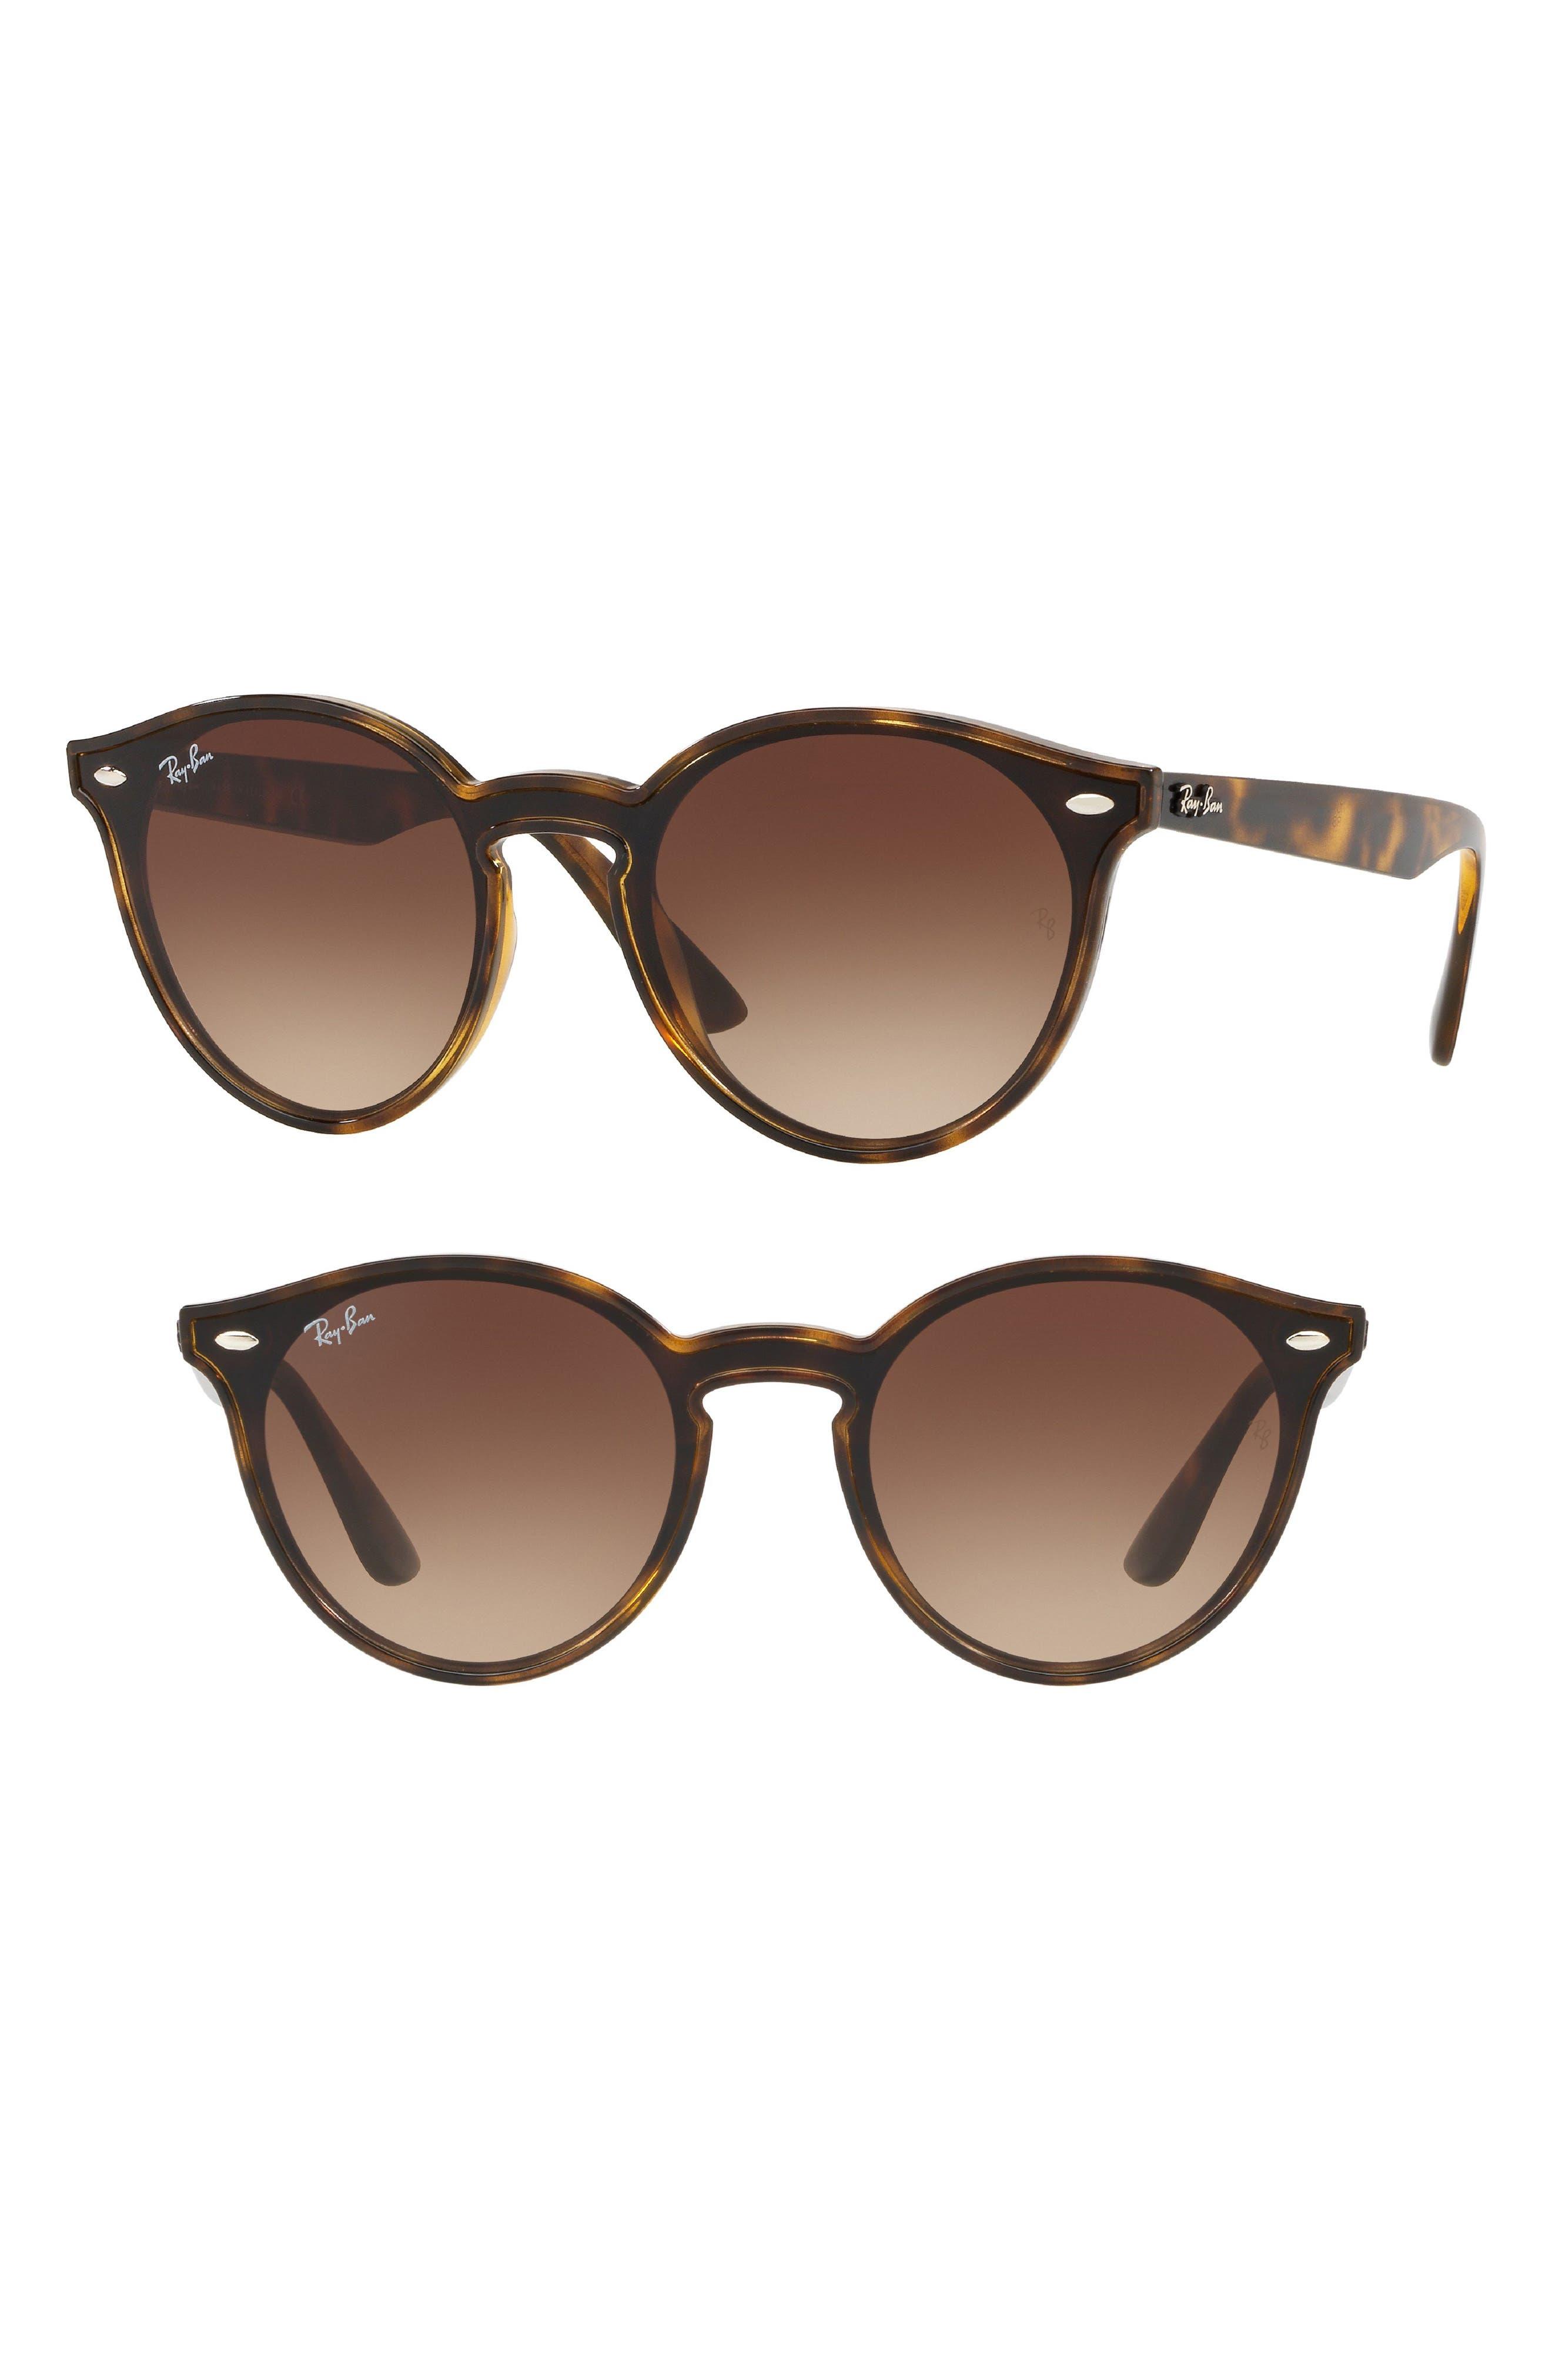 RAY-BAN Blaze 37mm Round Sunglasses, Main, color, LIGHT HAVANA GRADIENT